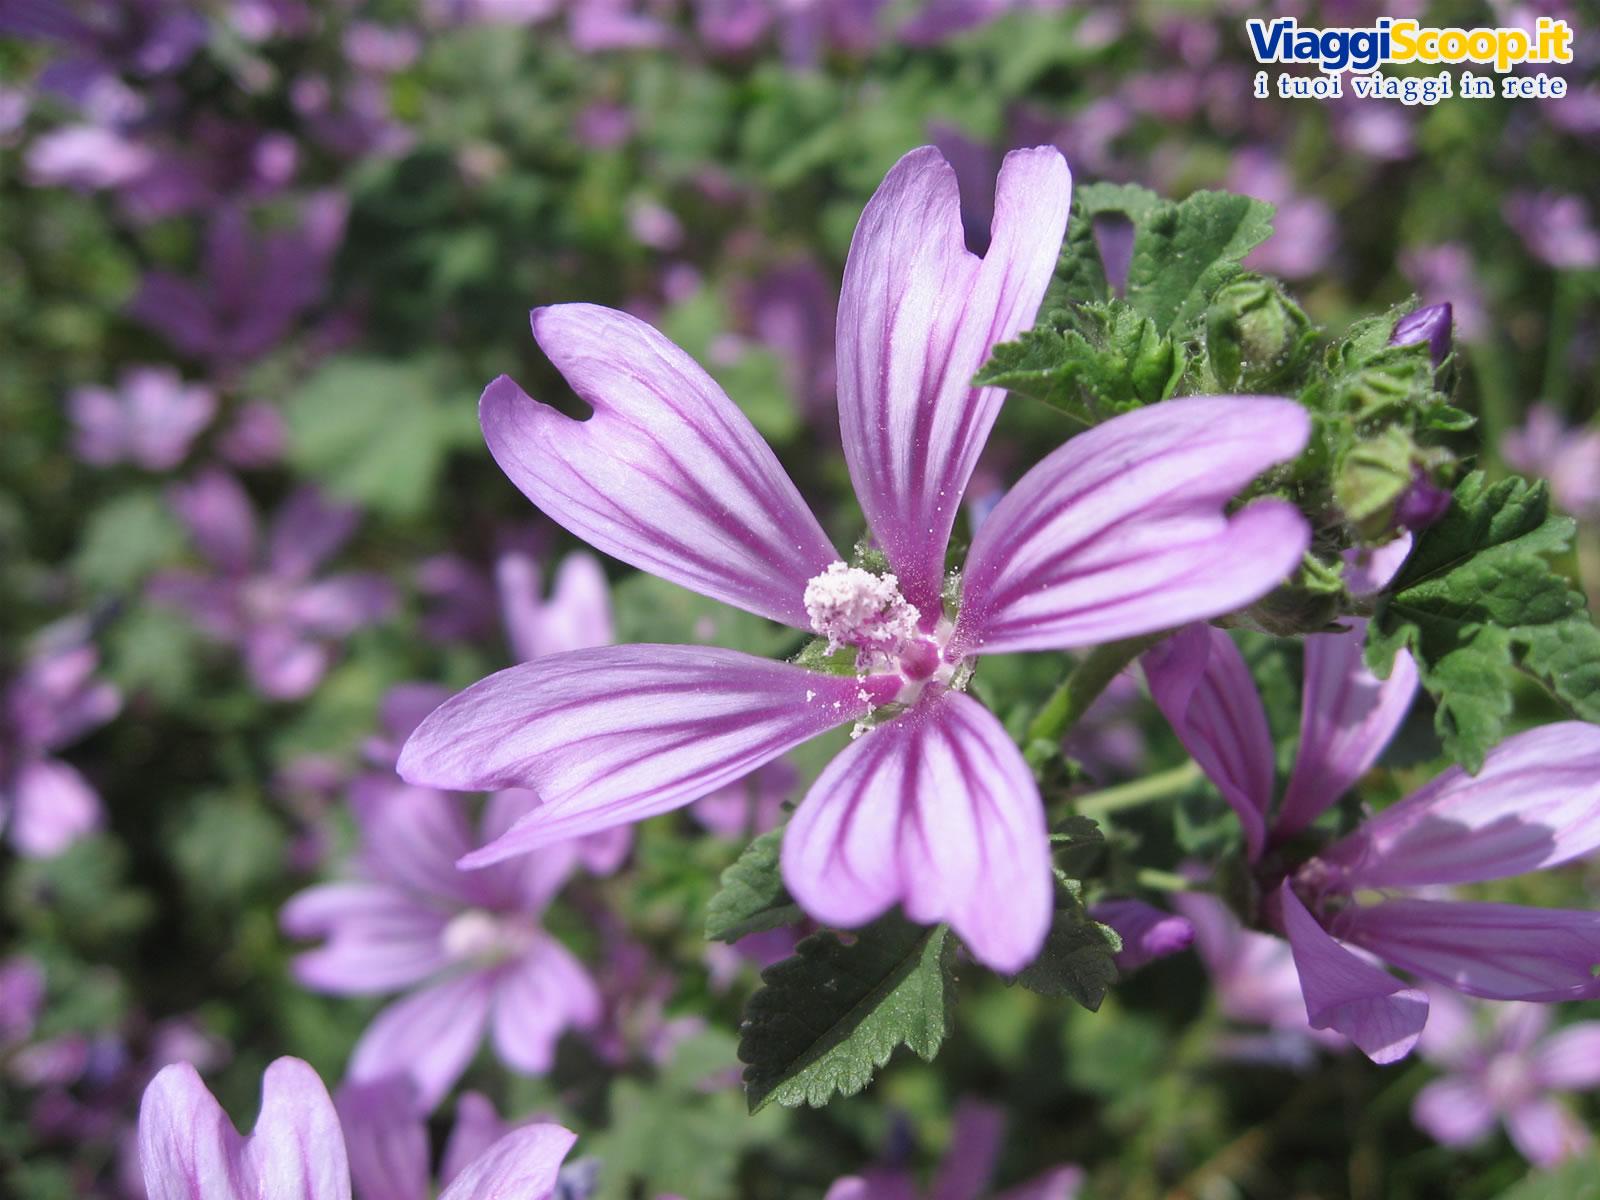 Sfondi desktop fiori floreali gli sfondi desktop pi for Sfondi desktop fiori